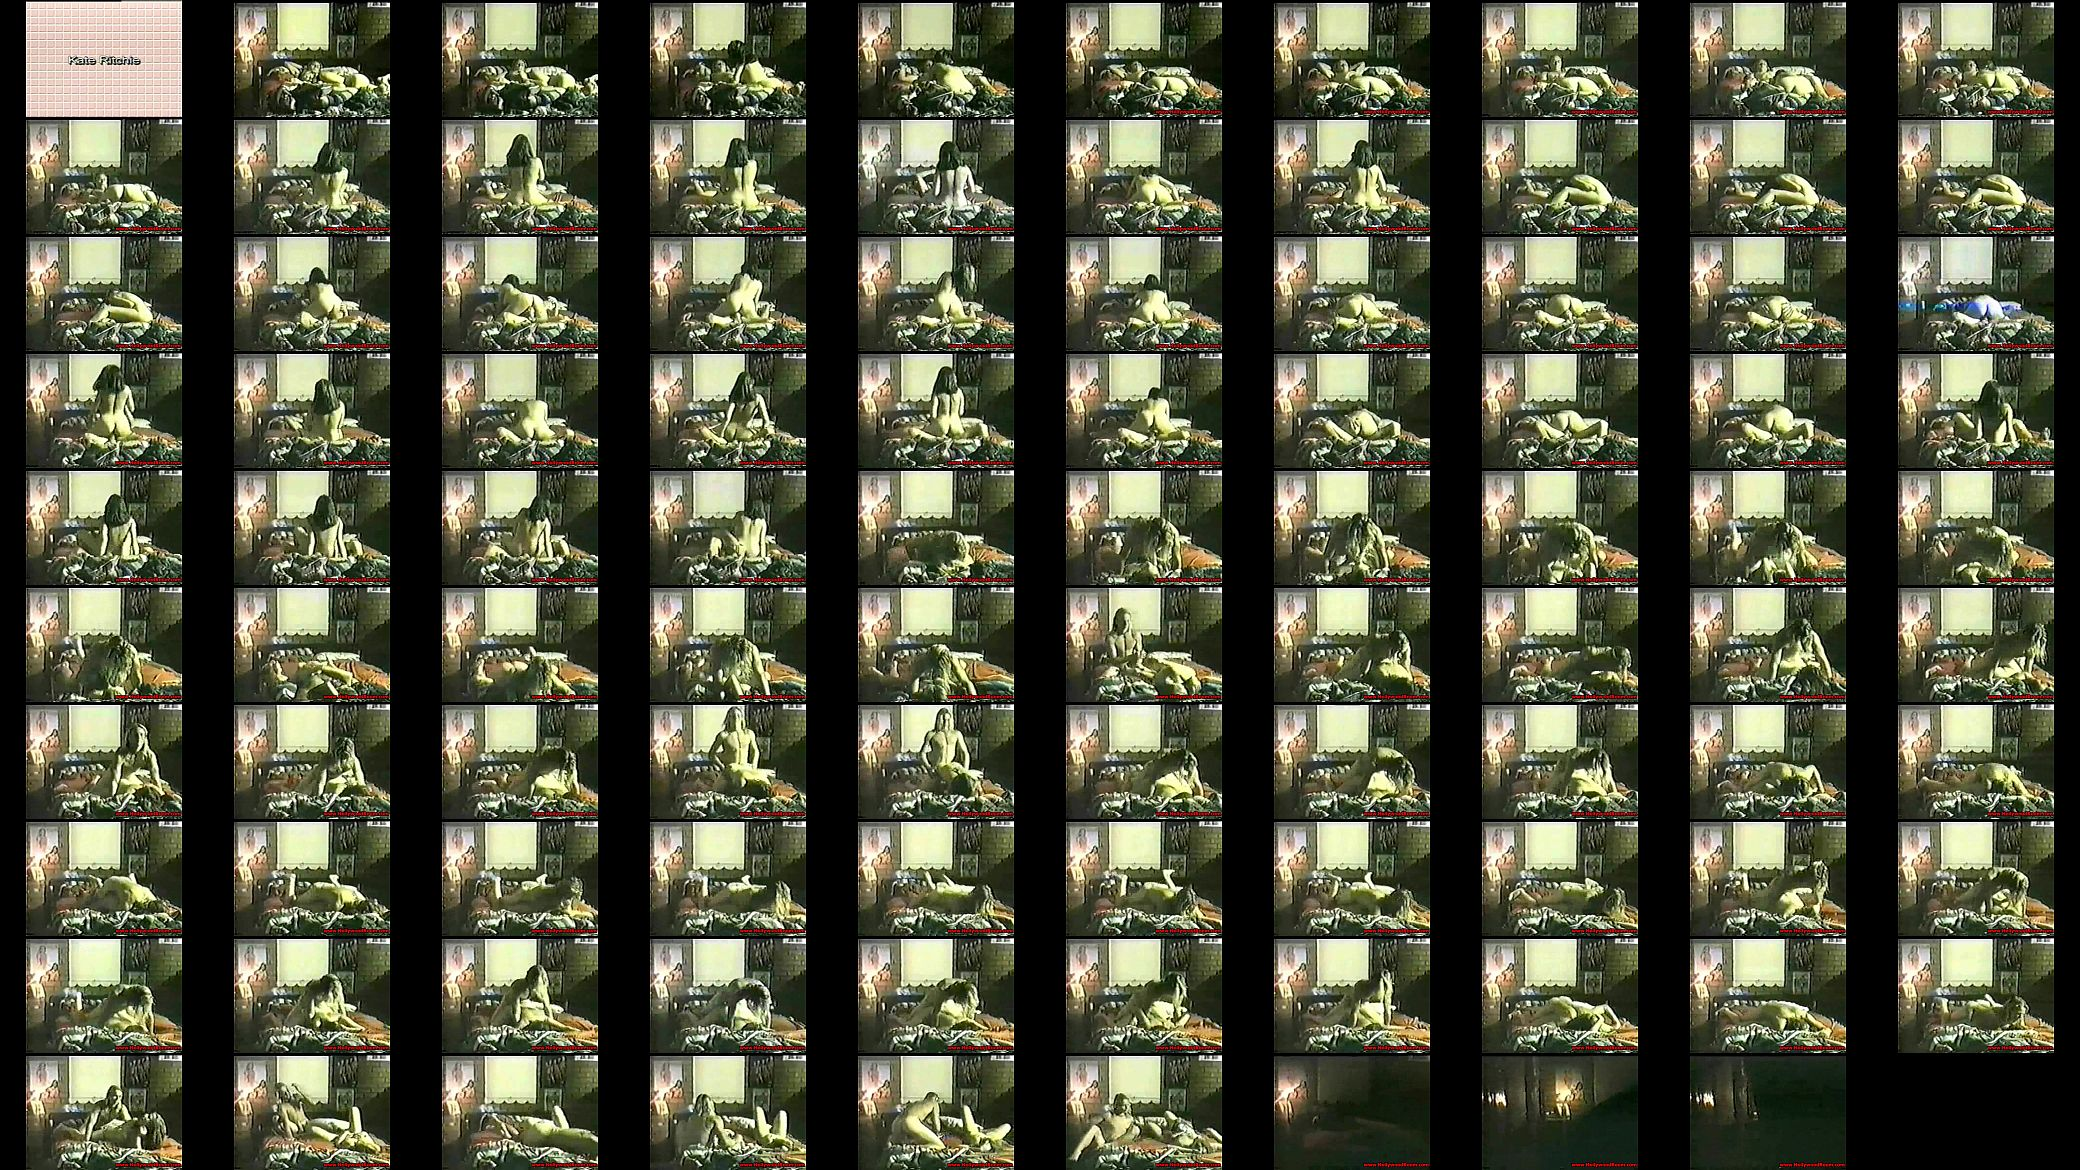 Stream kate ritchie sex tape random photo gallery